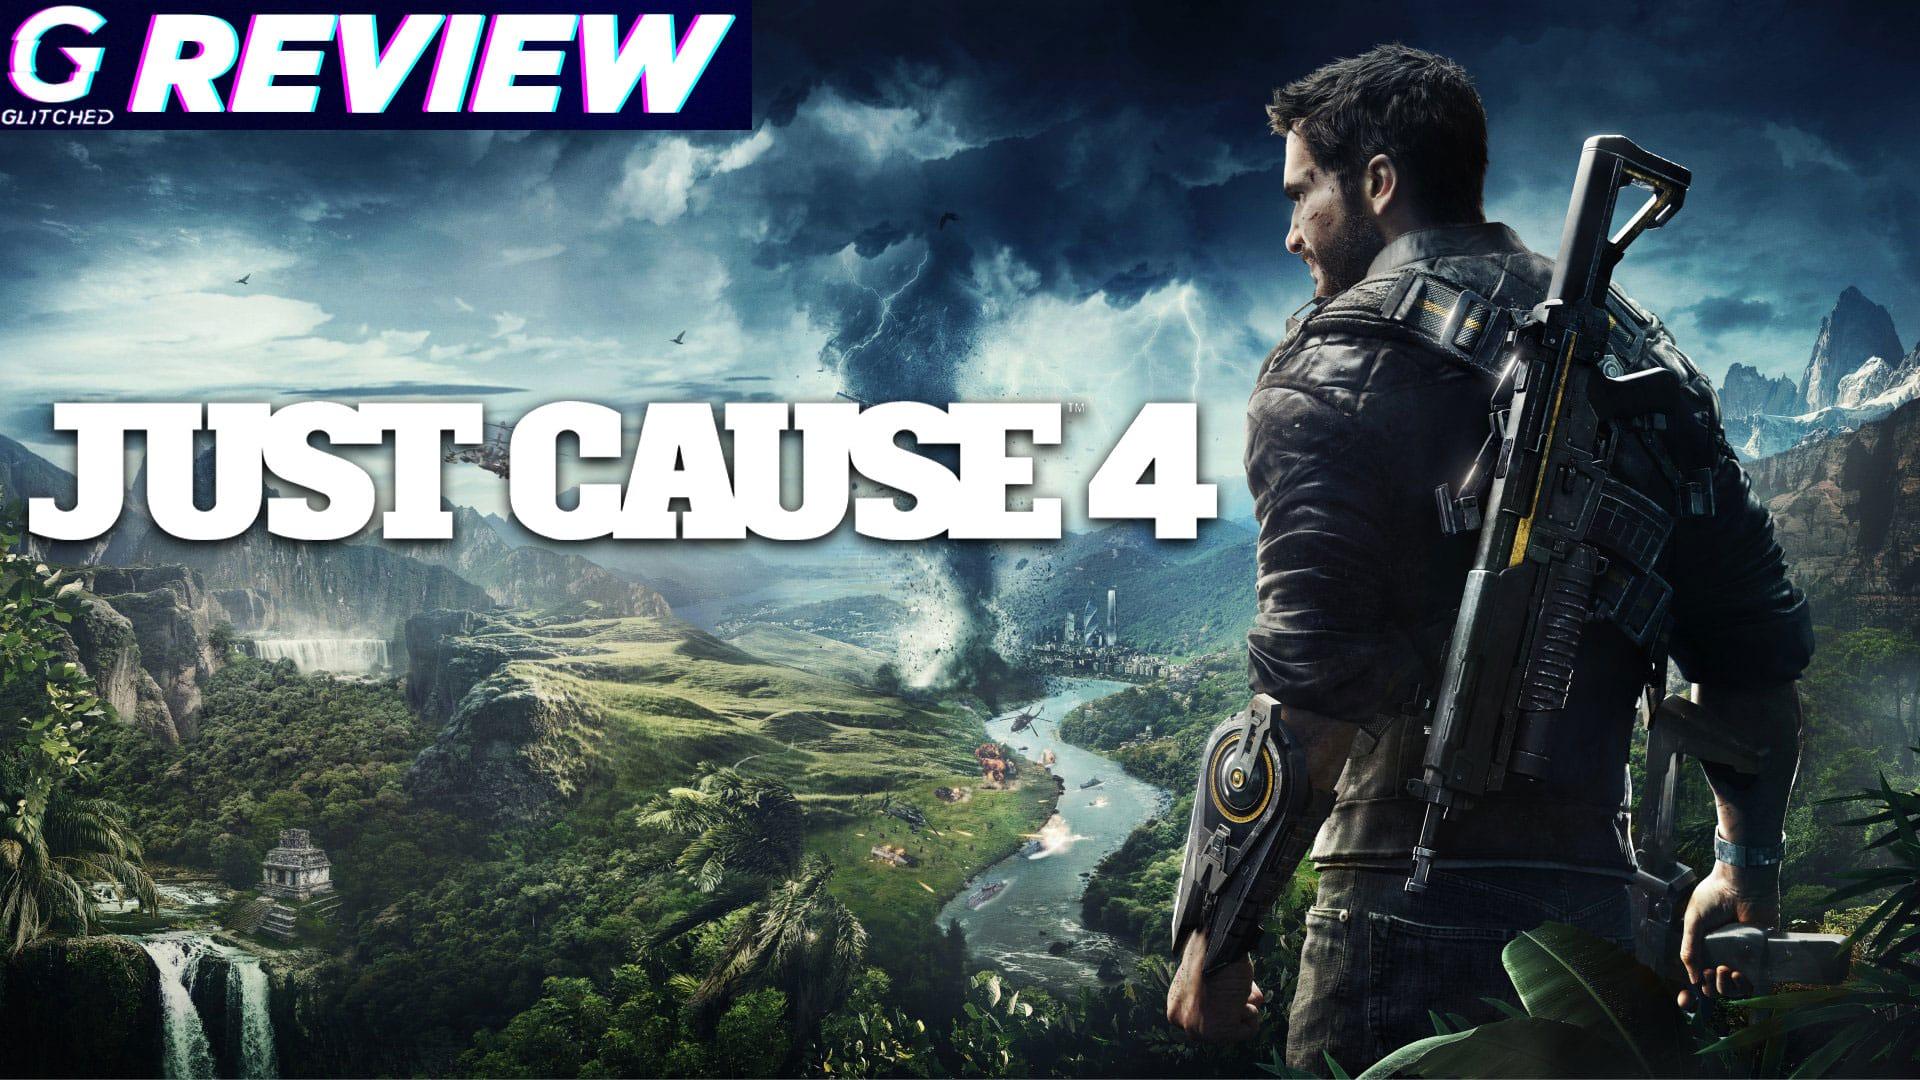 drastic movie online games